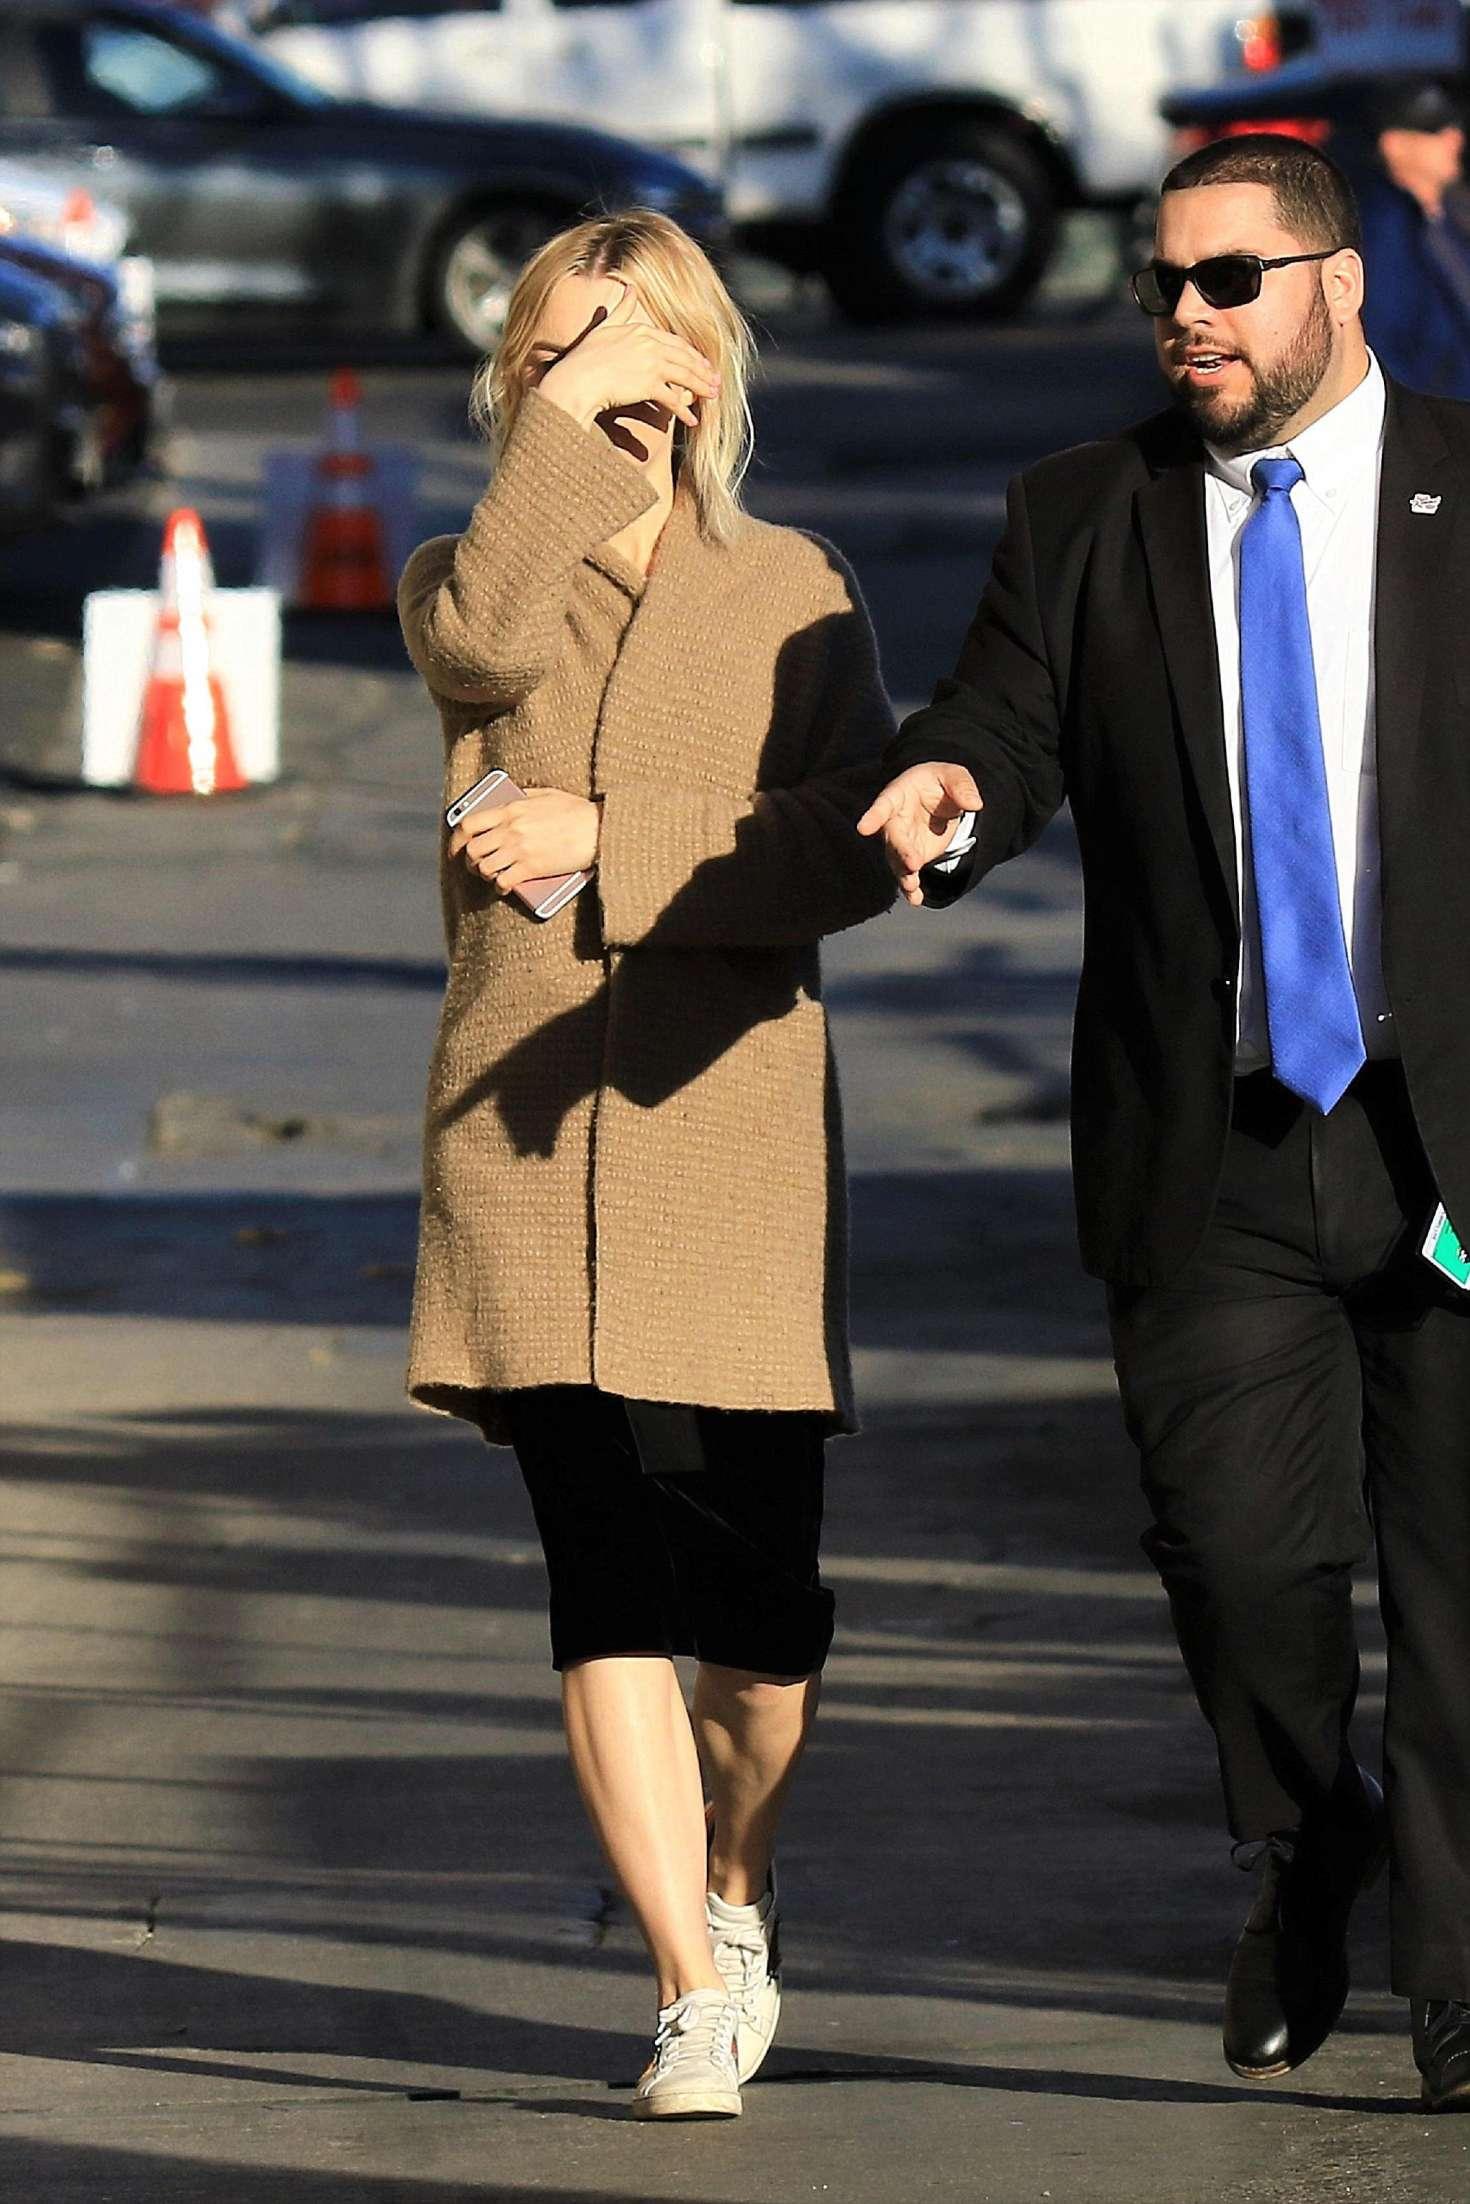 Saoirse Ronan 2018 : Saoirse Ronan: Arriving at Jimmy Kimmel Live -08